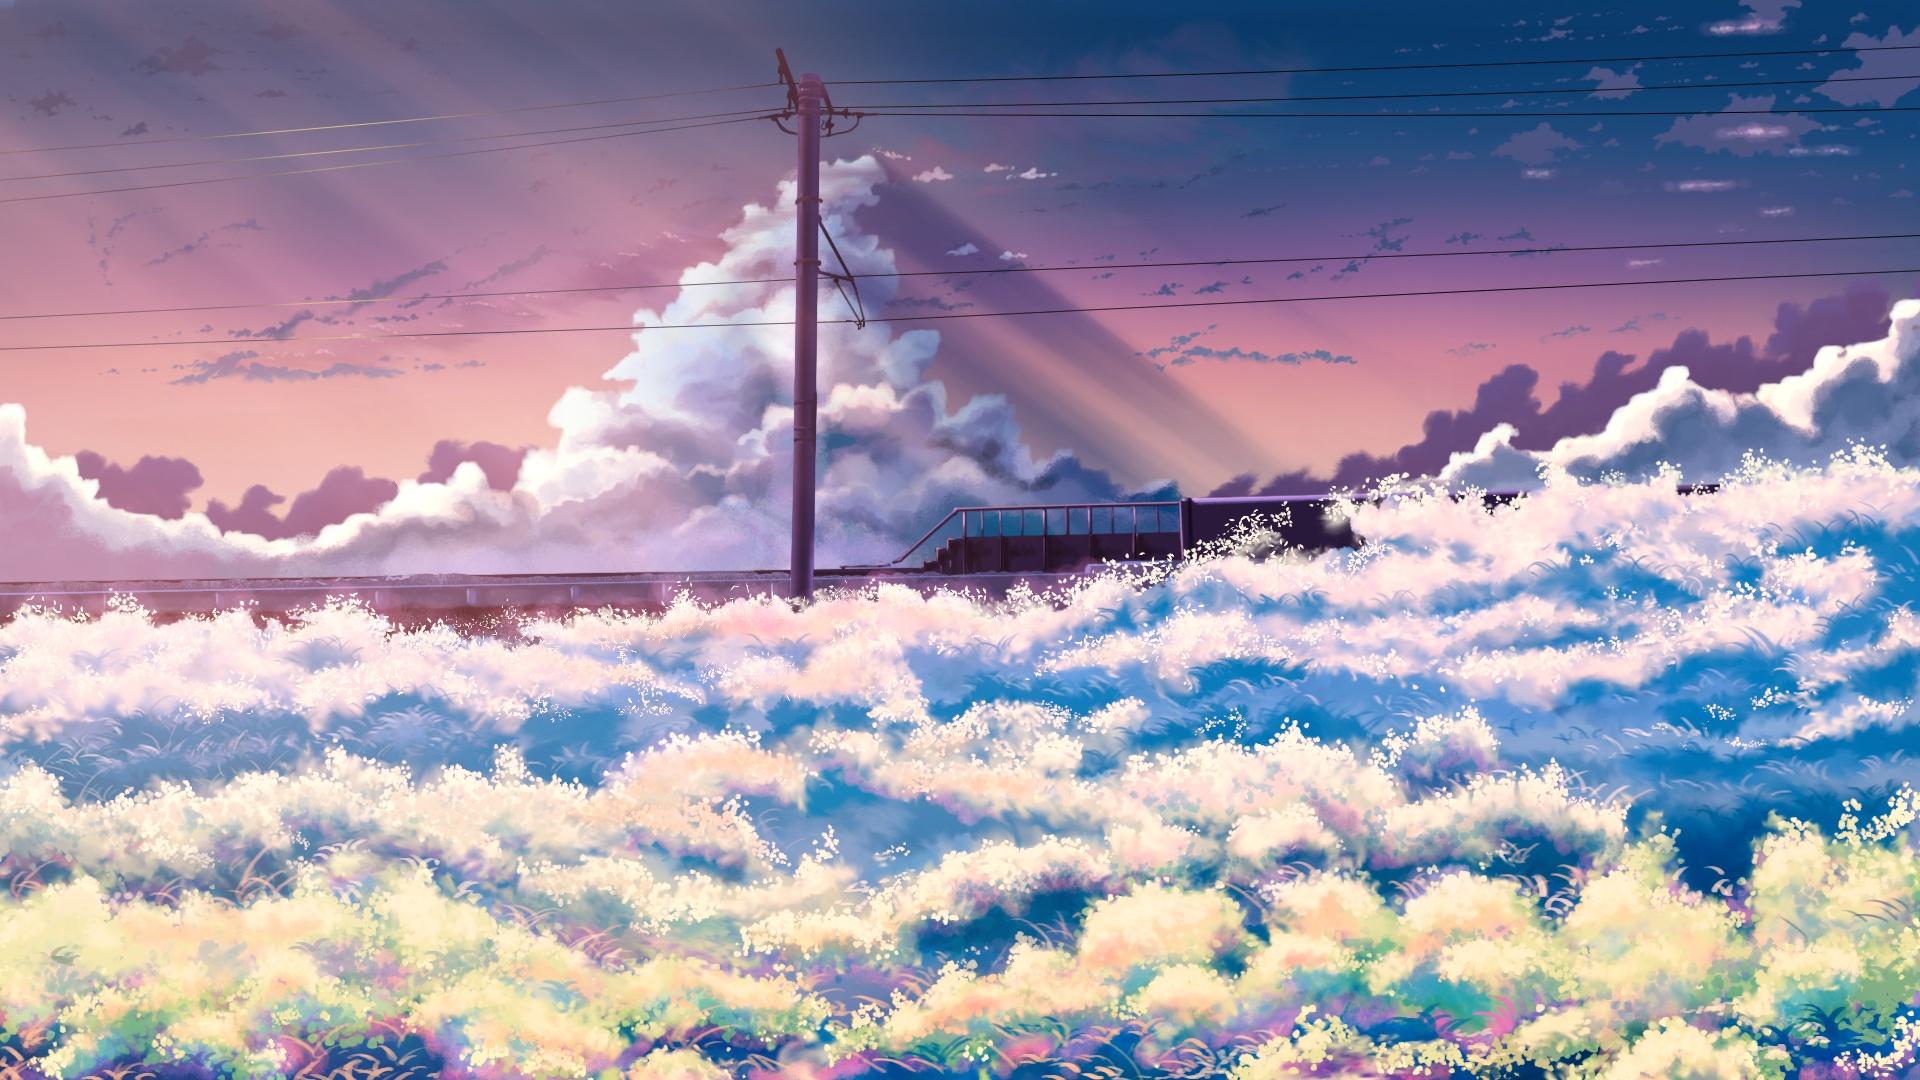 Anime Landscape With Clouds desktop wallpaper